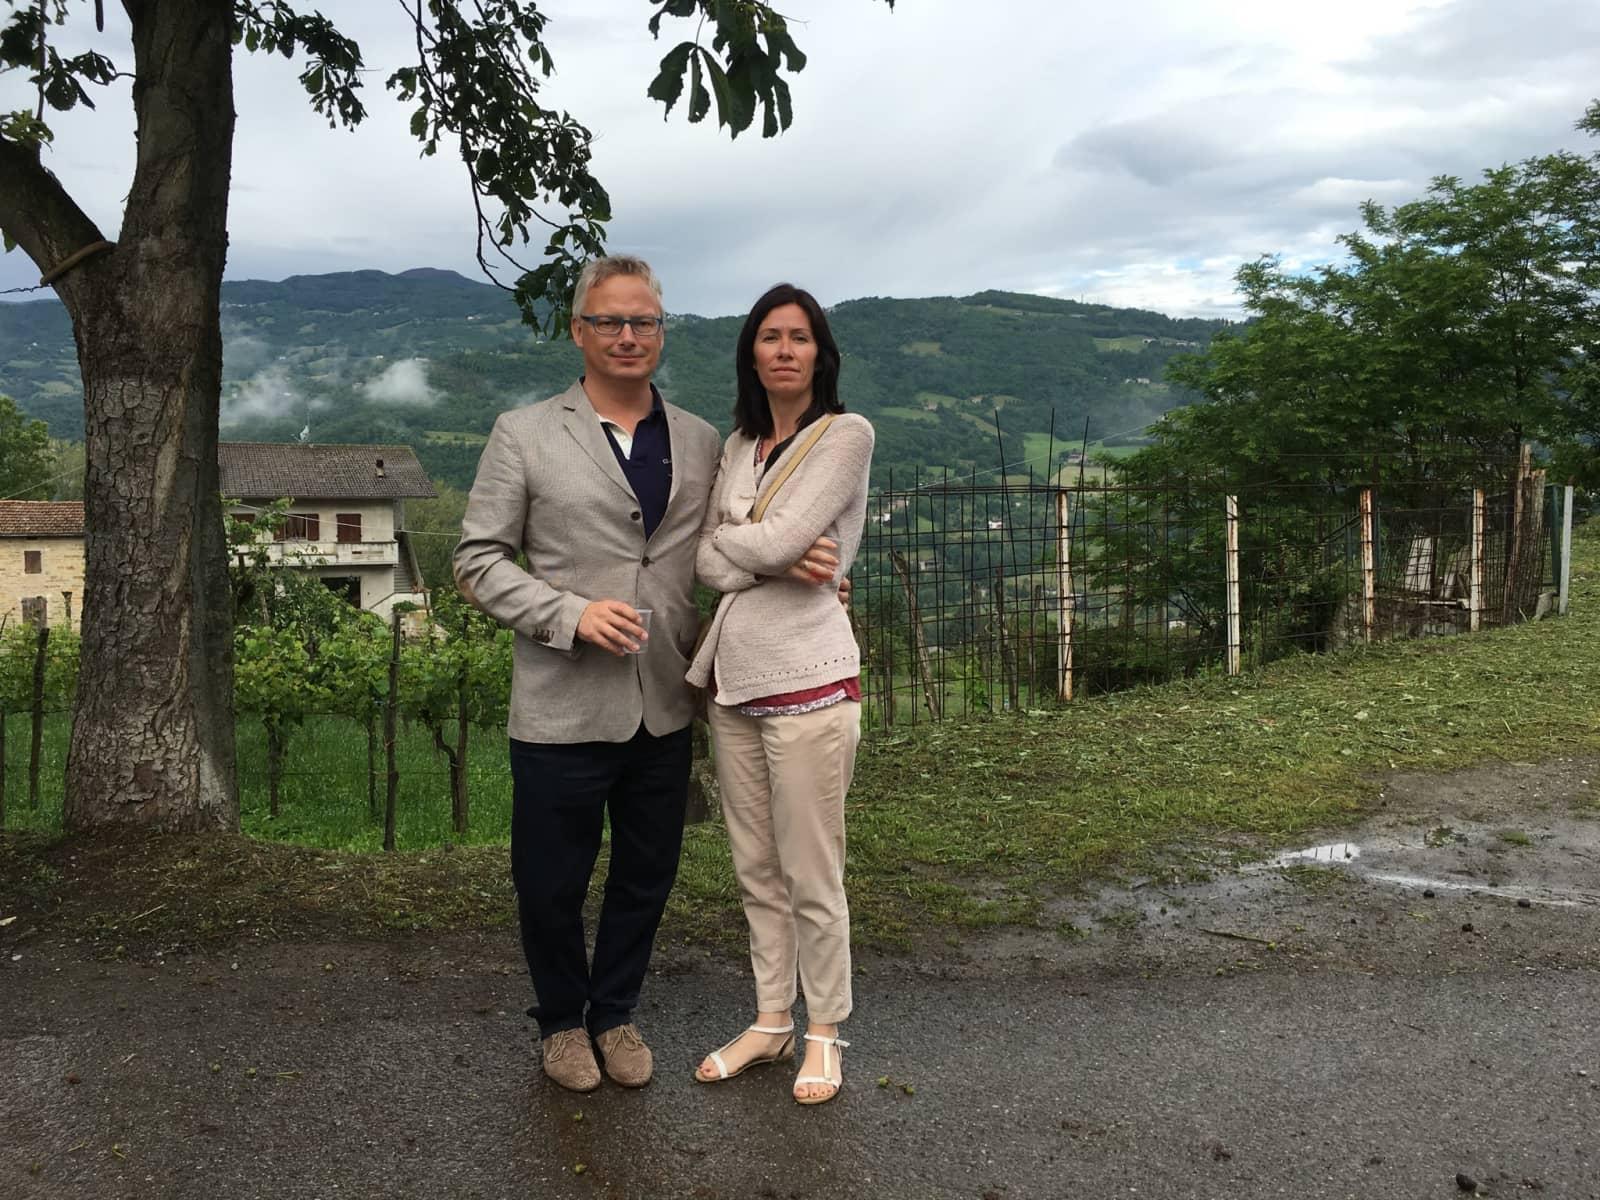 Jacob & Noelia from Zaragoza Centro, Spain